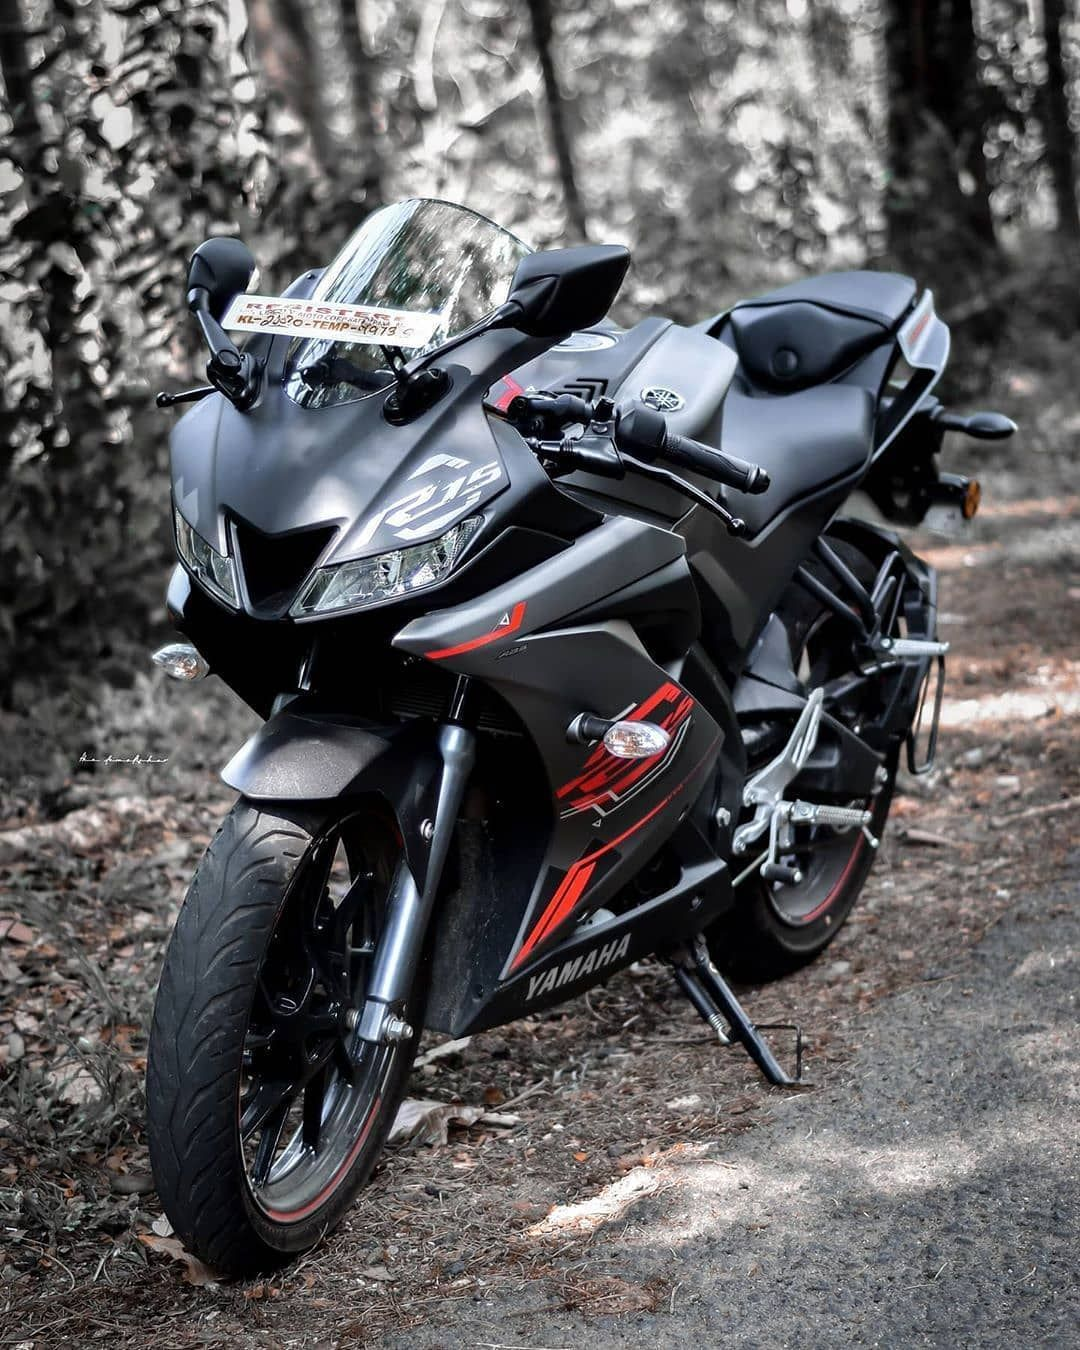 2 655 Likes 4 Comments R15 V3 India R15v3ind On Instagram Thunder Grey The Bae The Demolishor Motorcycle Wallpaper Bike Pic Yamaha Bikes